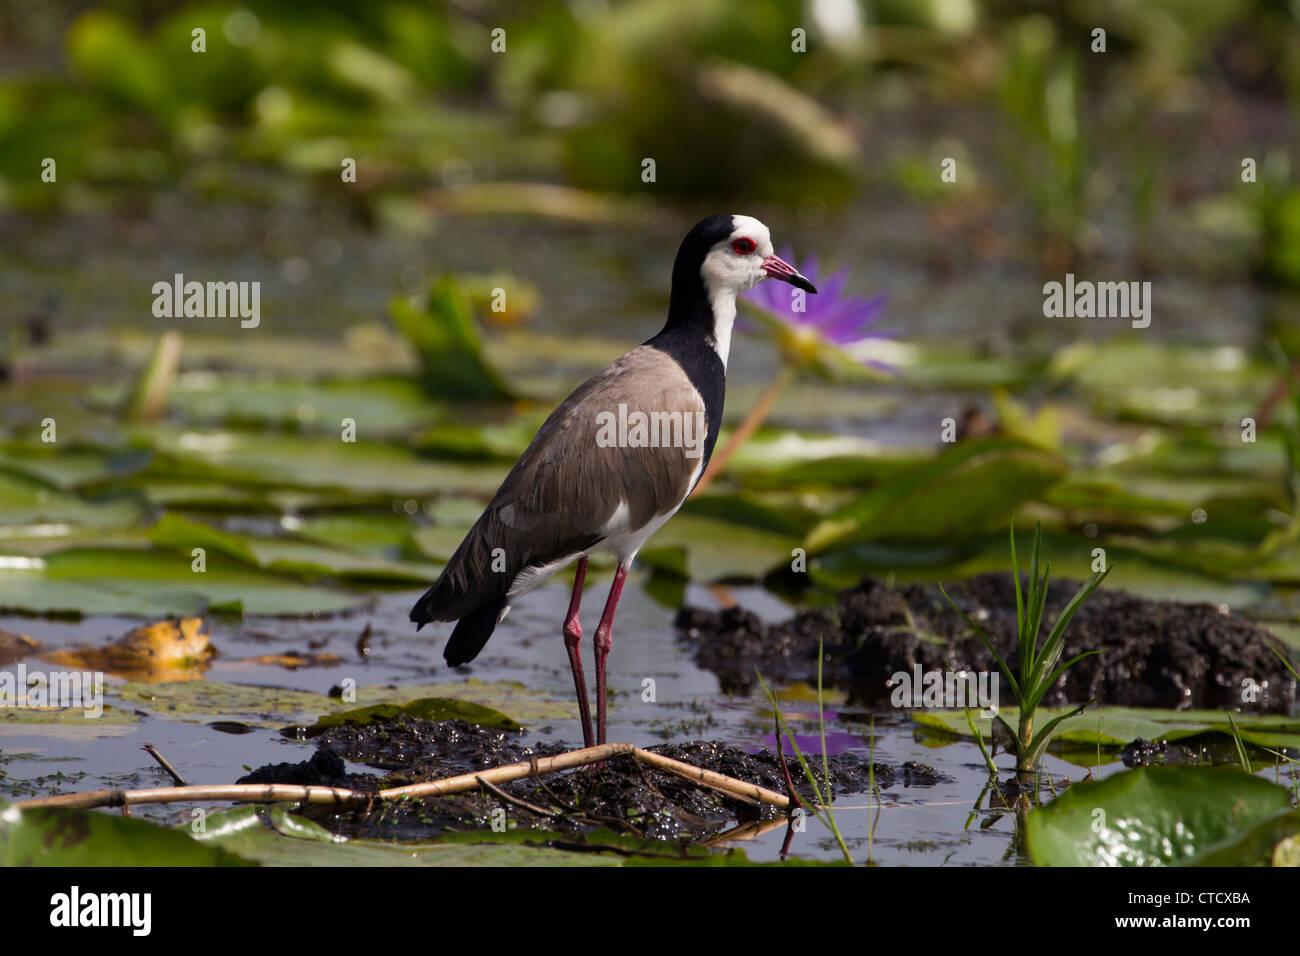 Long toed Plover (Vanellus crassirostris) in Mabamba Swamp, Uganda - Stock Image